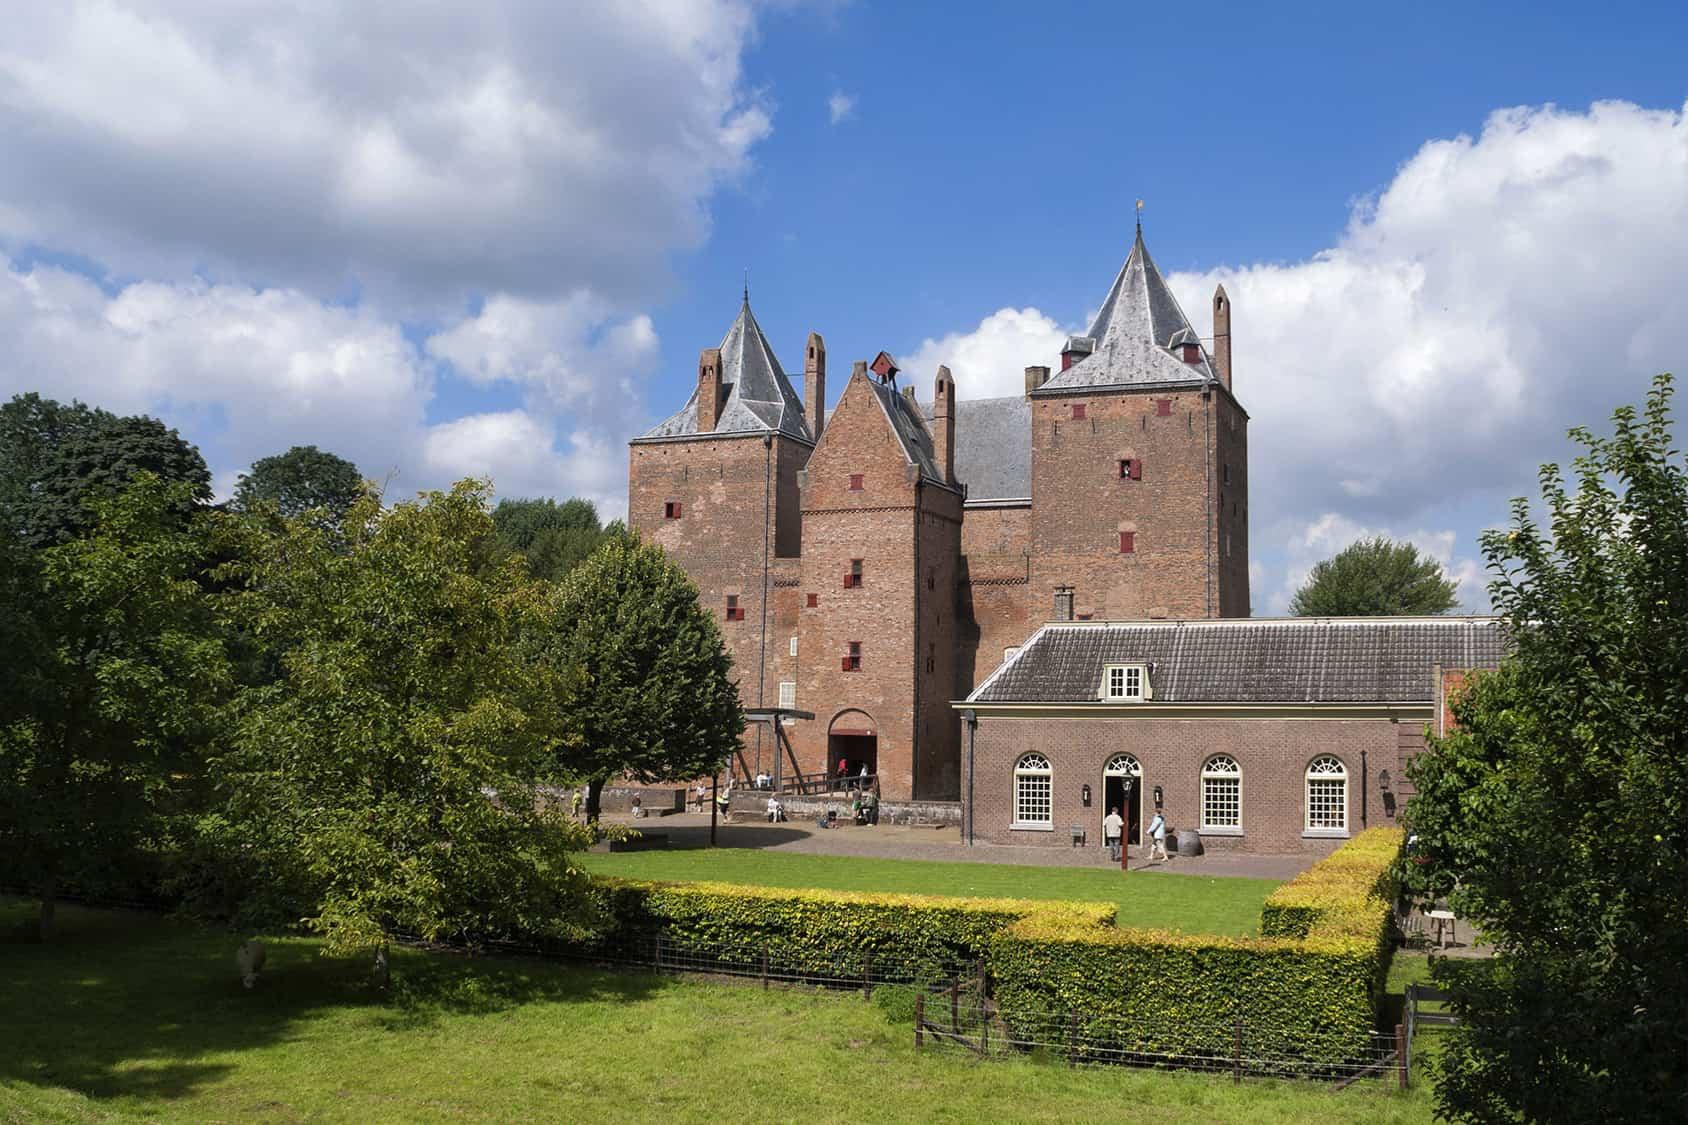 Kasteel slot Loevestein